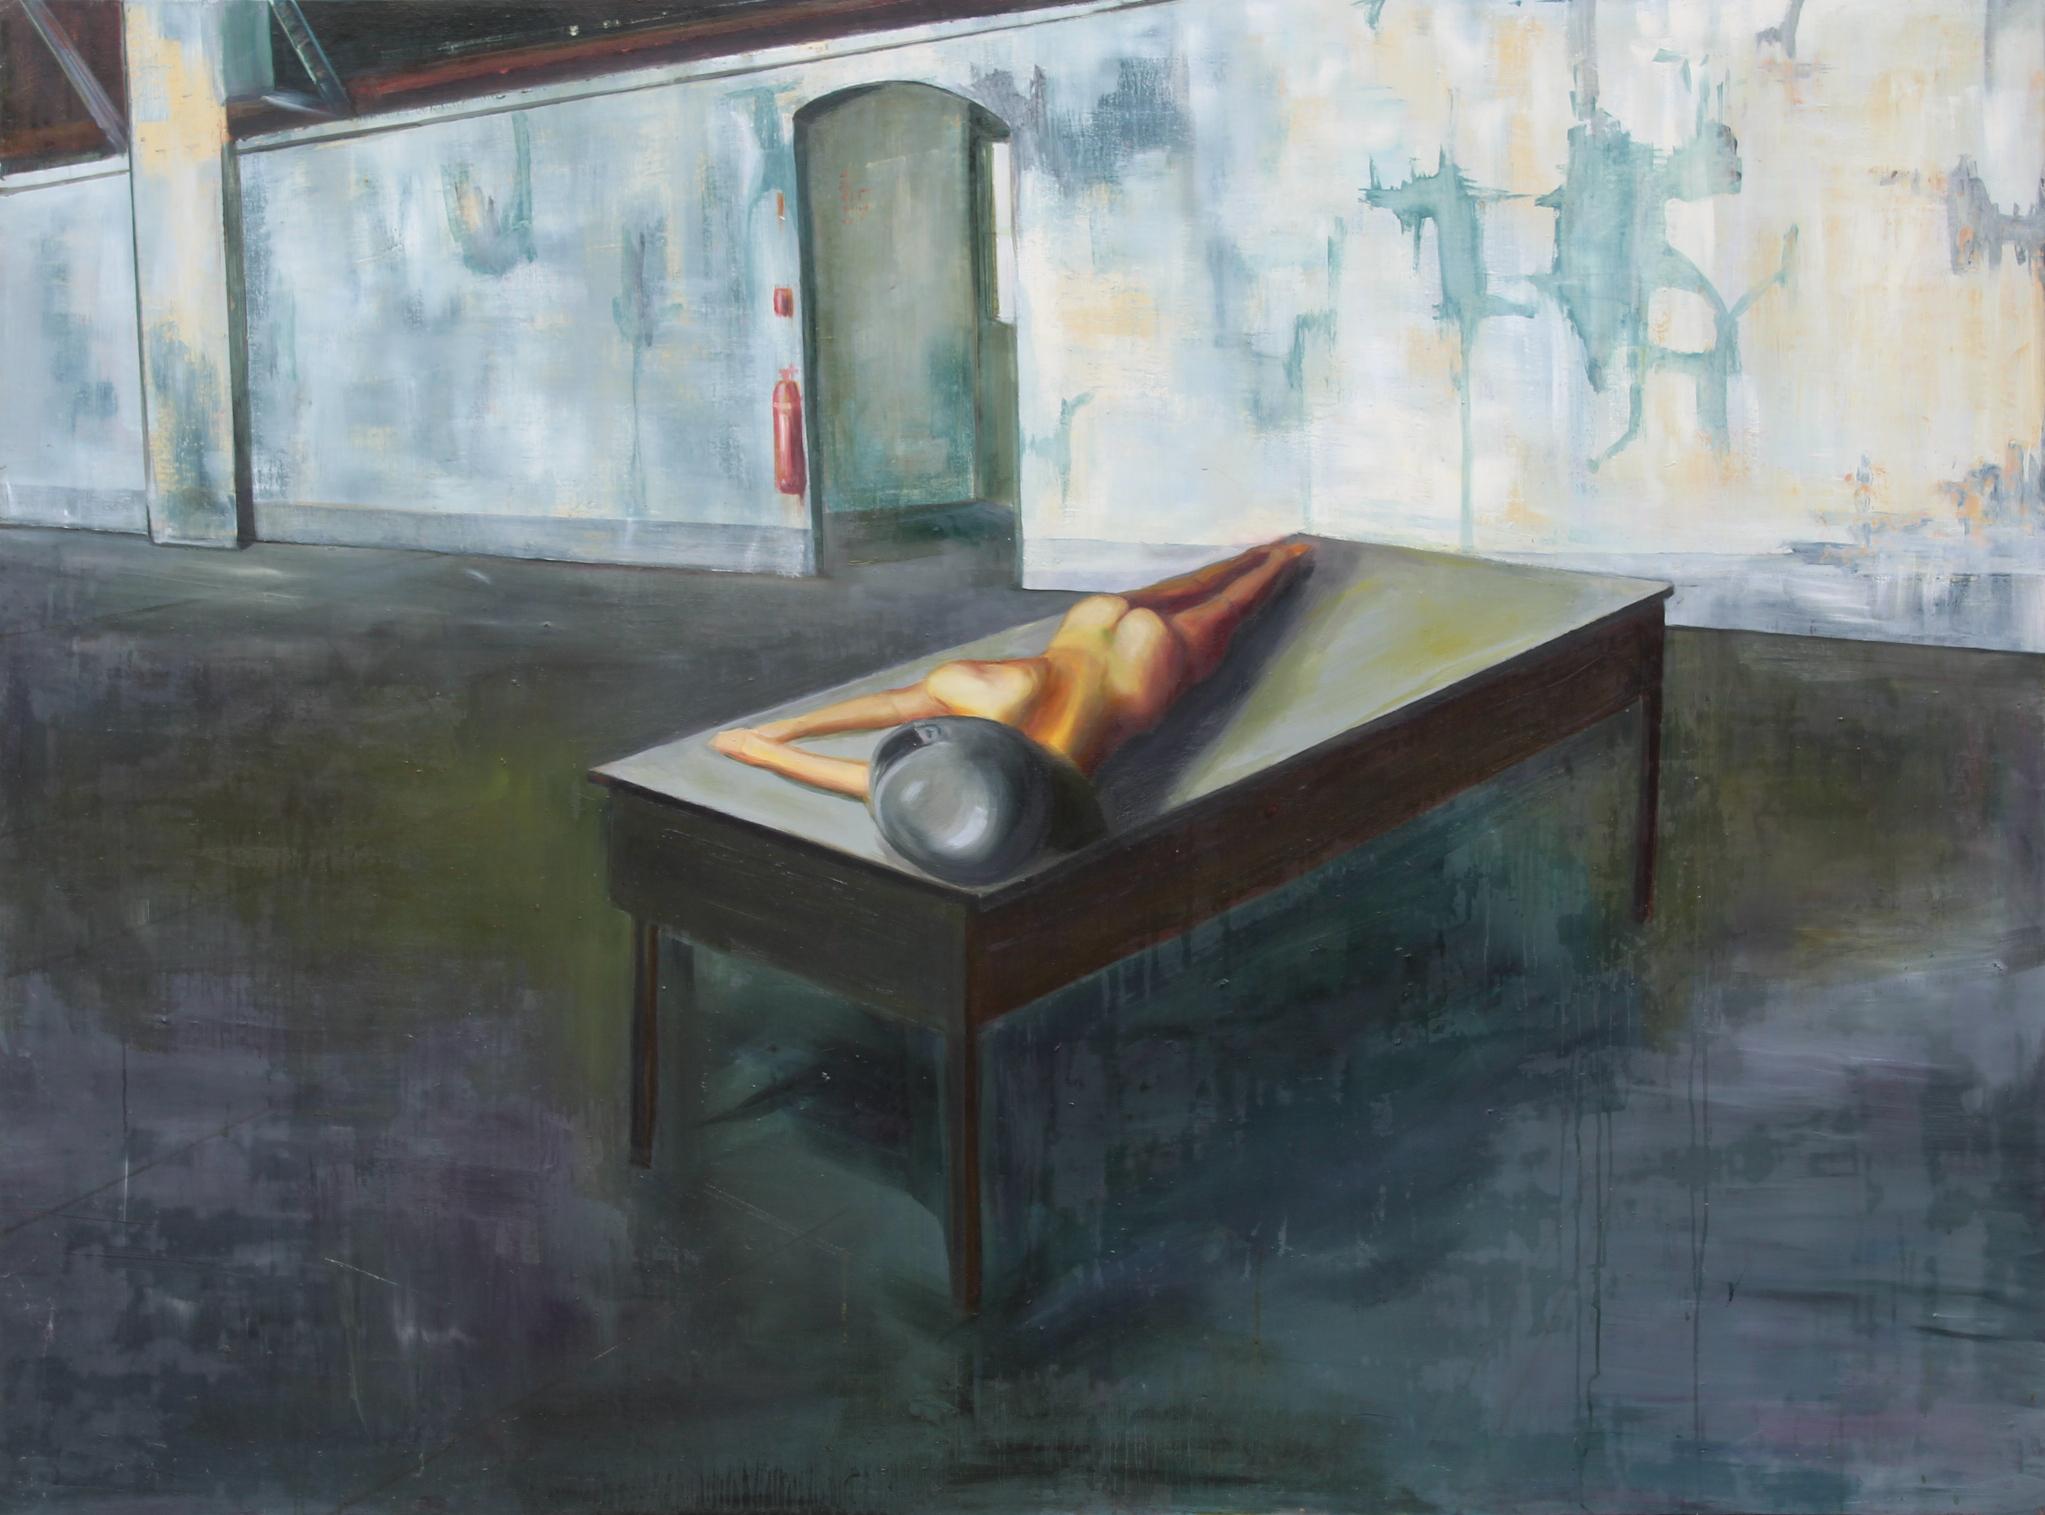 Adrienn Erdei Shortening nude, oil on canvas, 200 × 150 cm, 2016.